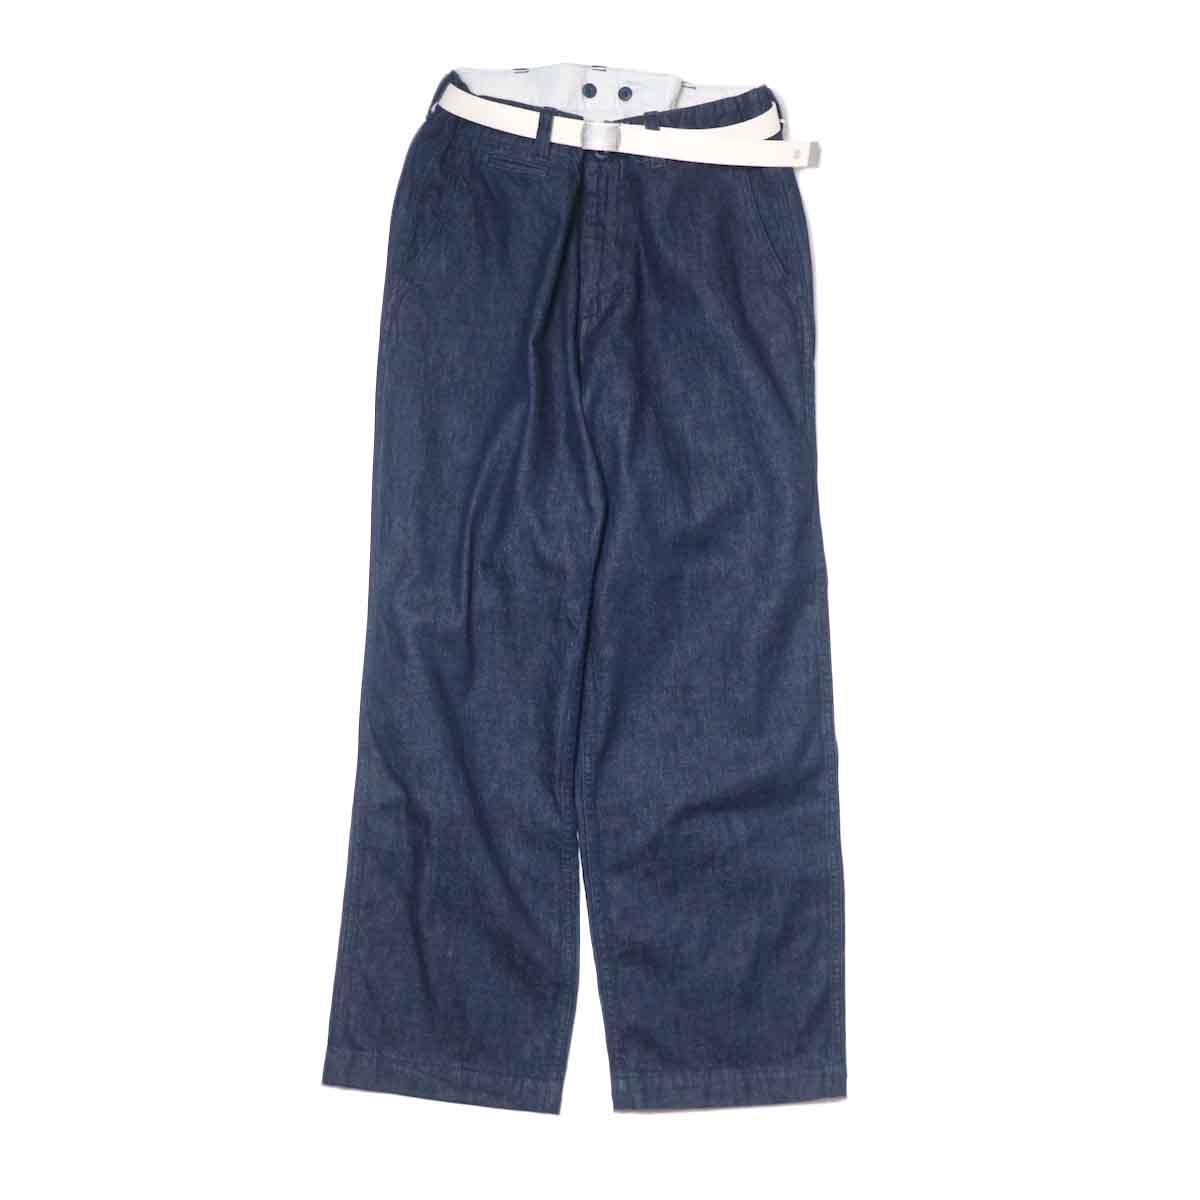 MASTER&Co. / ONE WASHED DENIM LONG PANTS